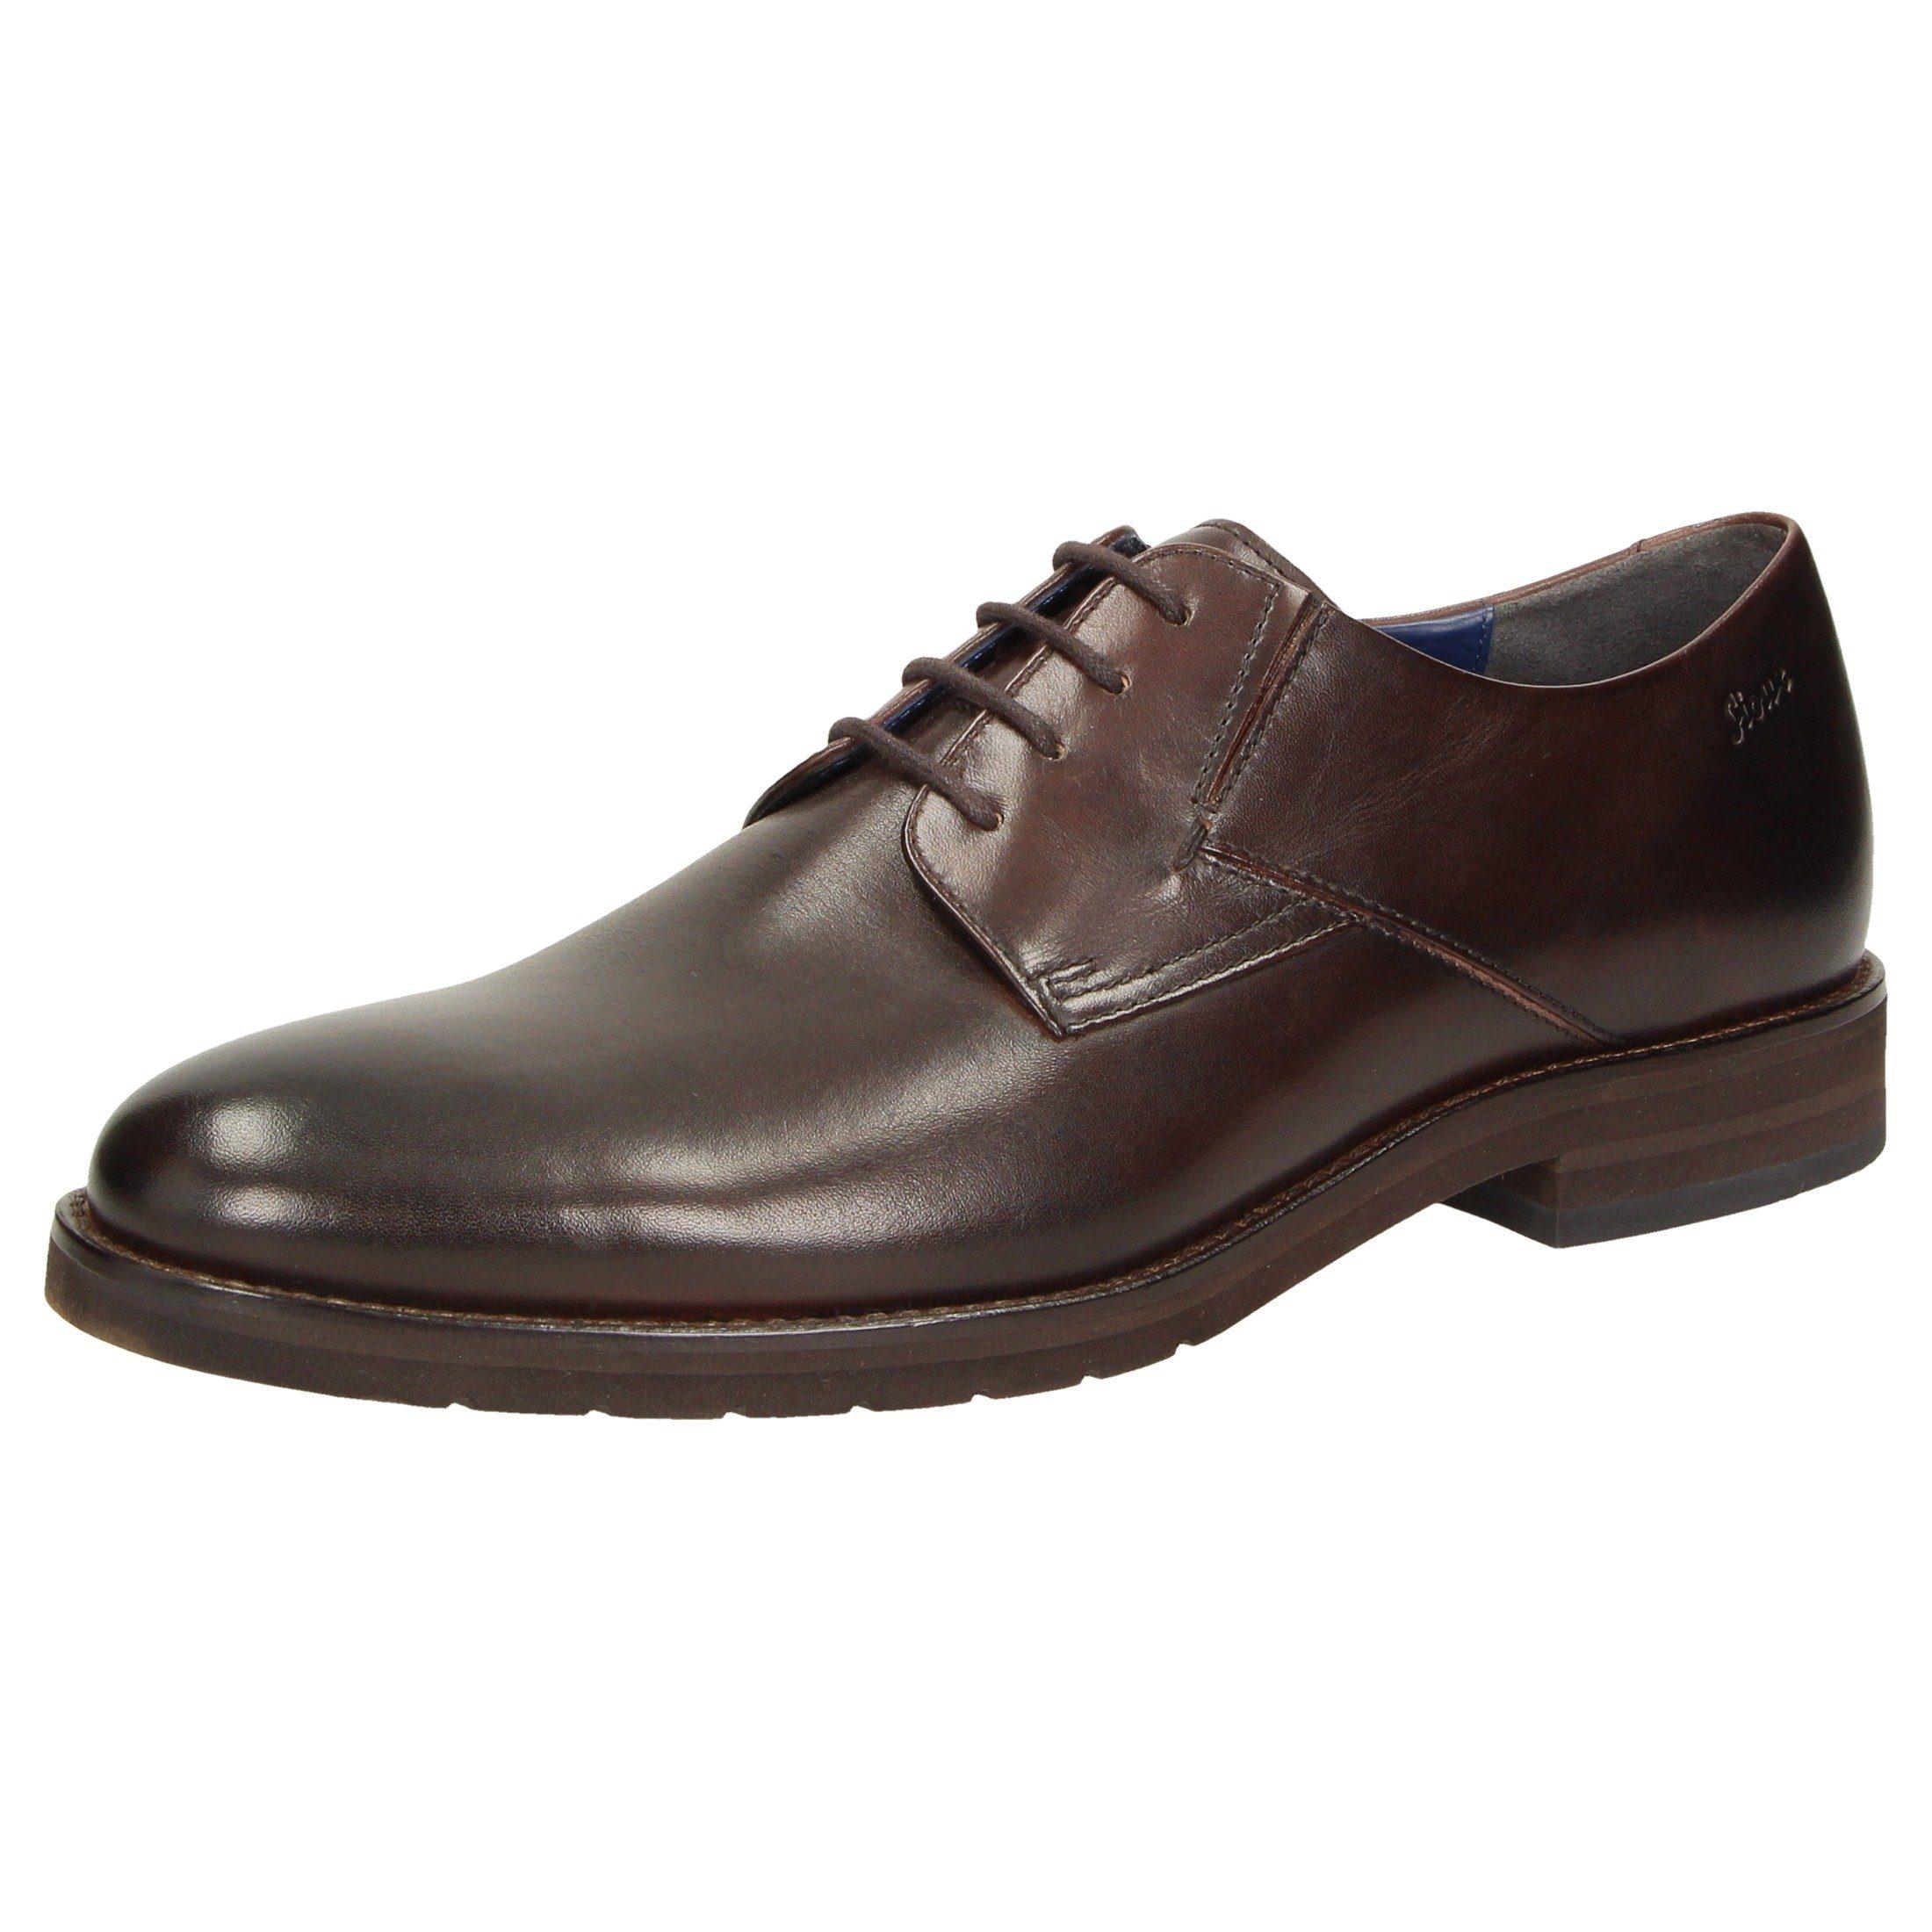 SIOUX Schnürschuh Jaromir-700 | Schuhe > Schnürschuhe | Braun | Leder | Sioux